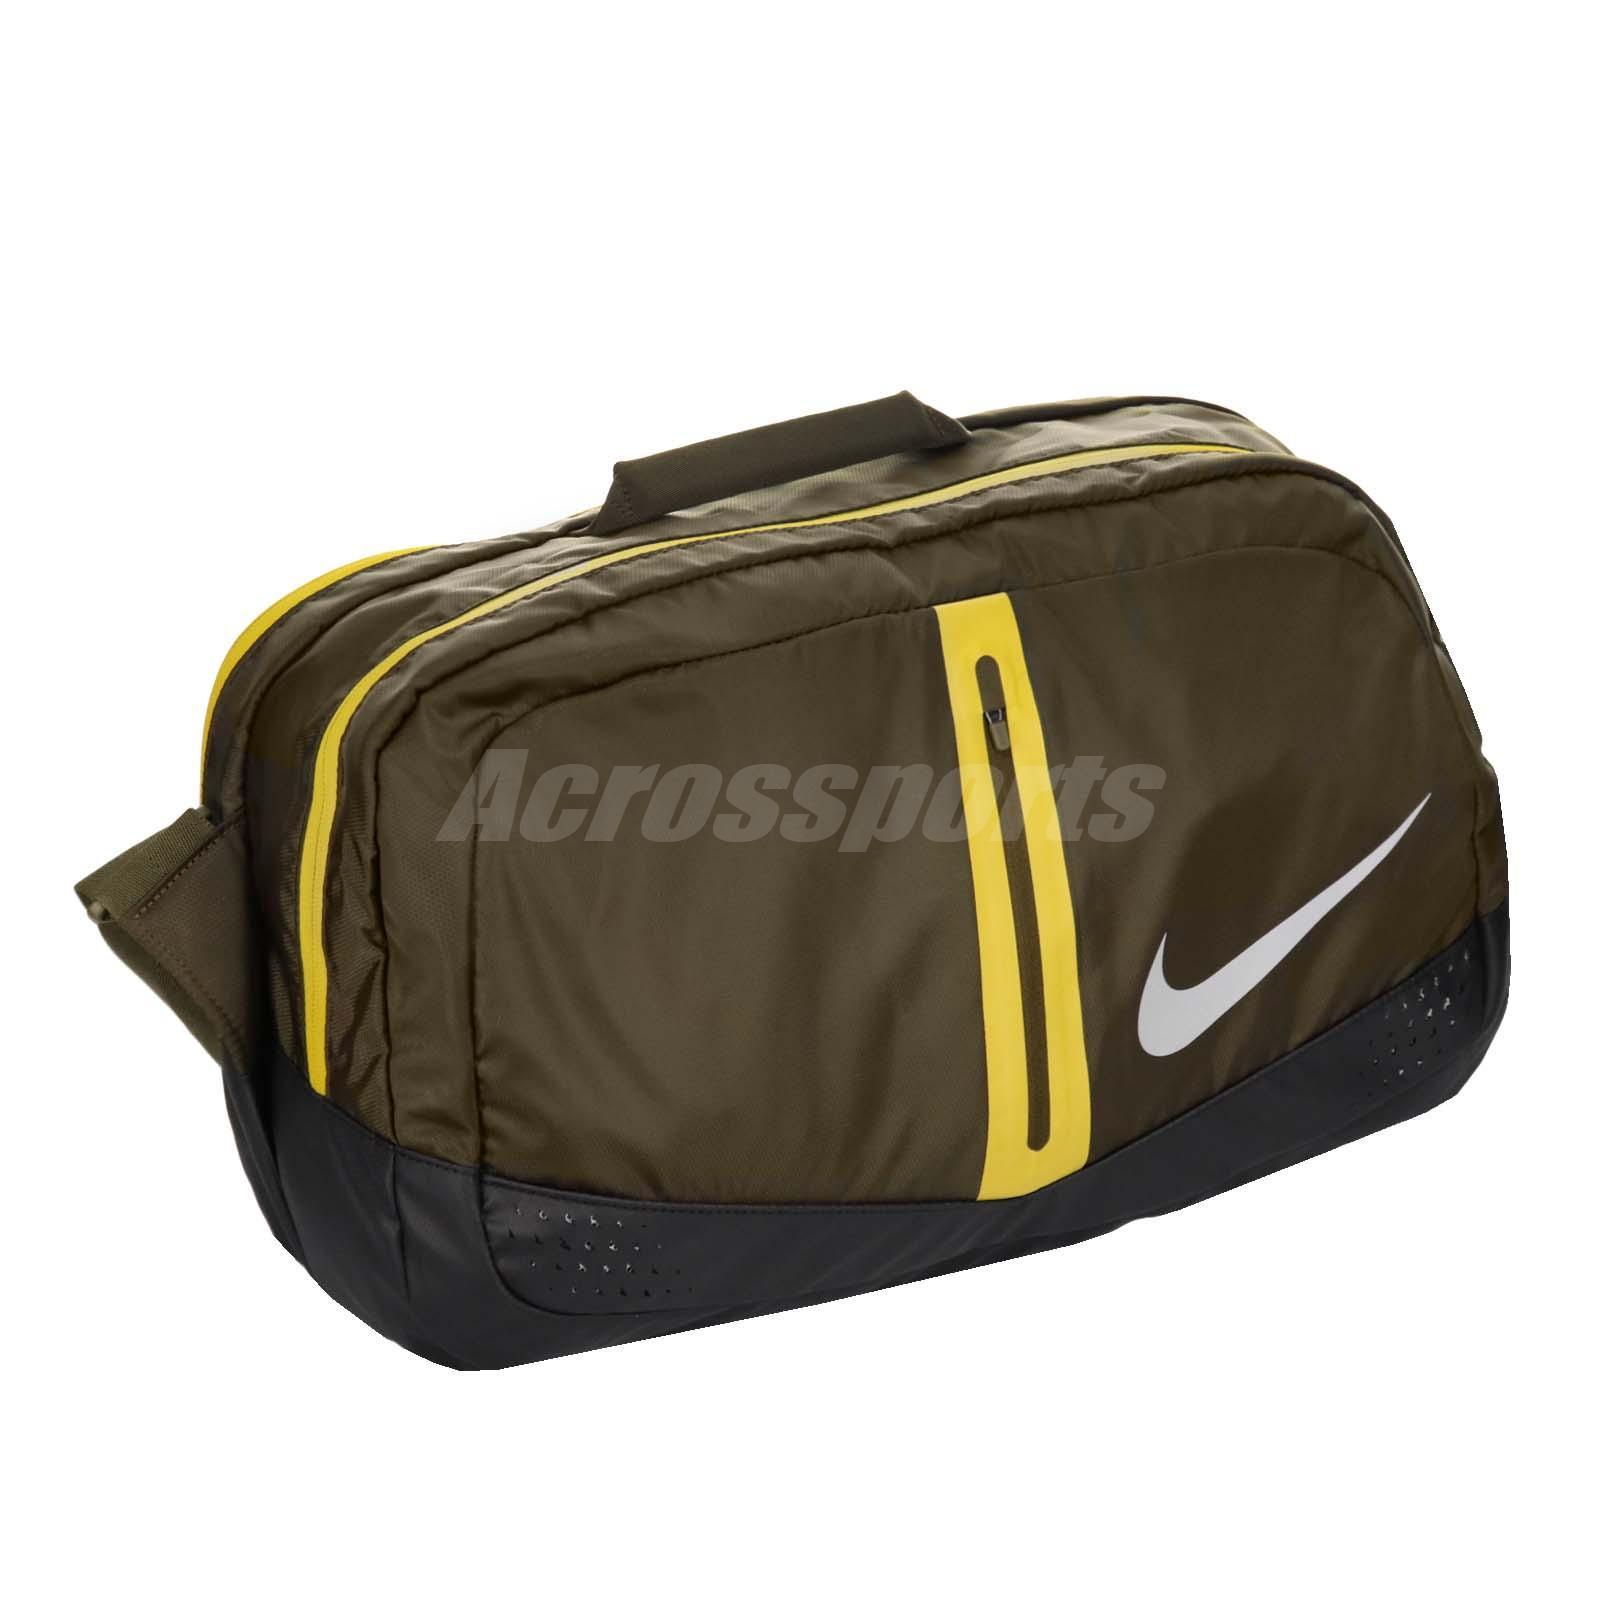 47b37f795f0b Details about Nike Run Speed Duffel Bag 34L Bag Green Yellow Duffle  Reflevtive NRI0232-7NS